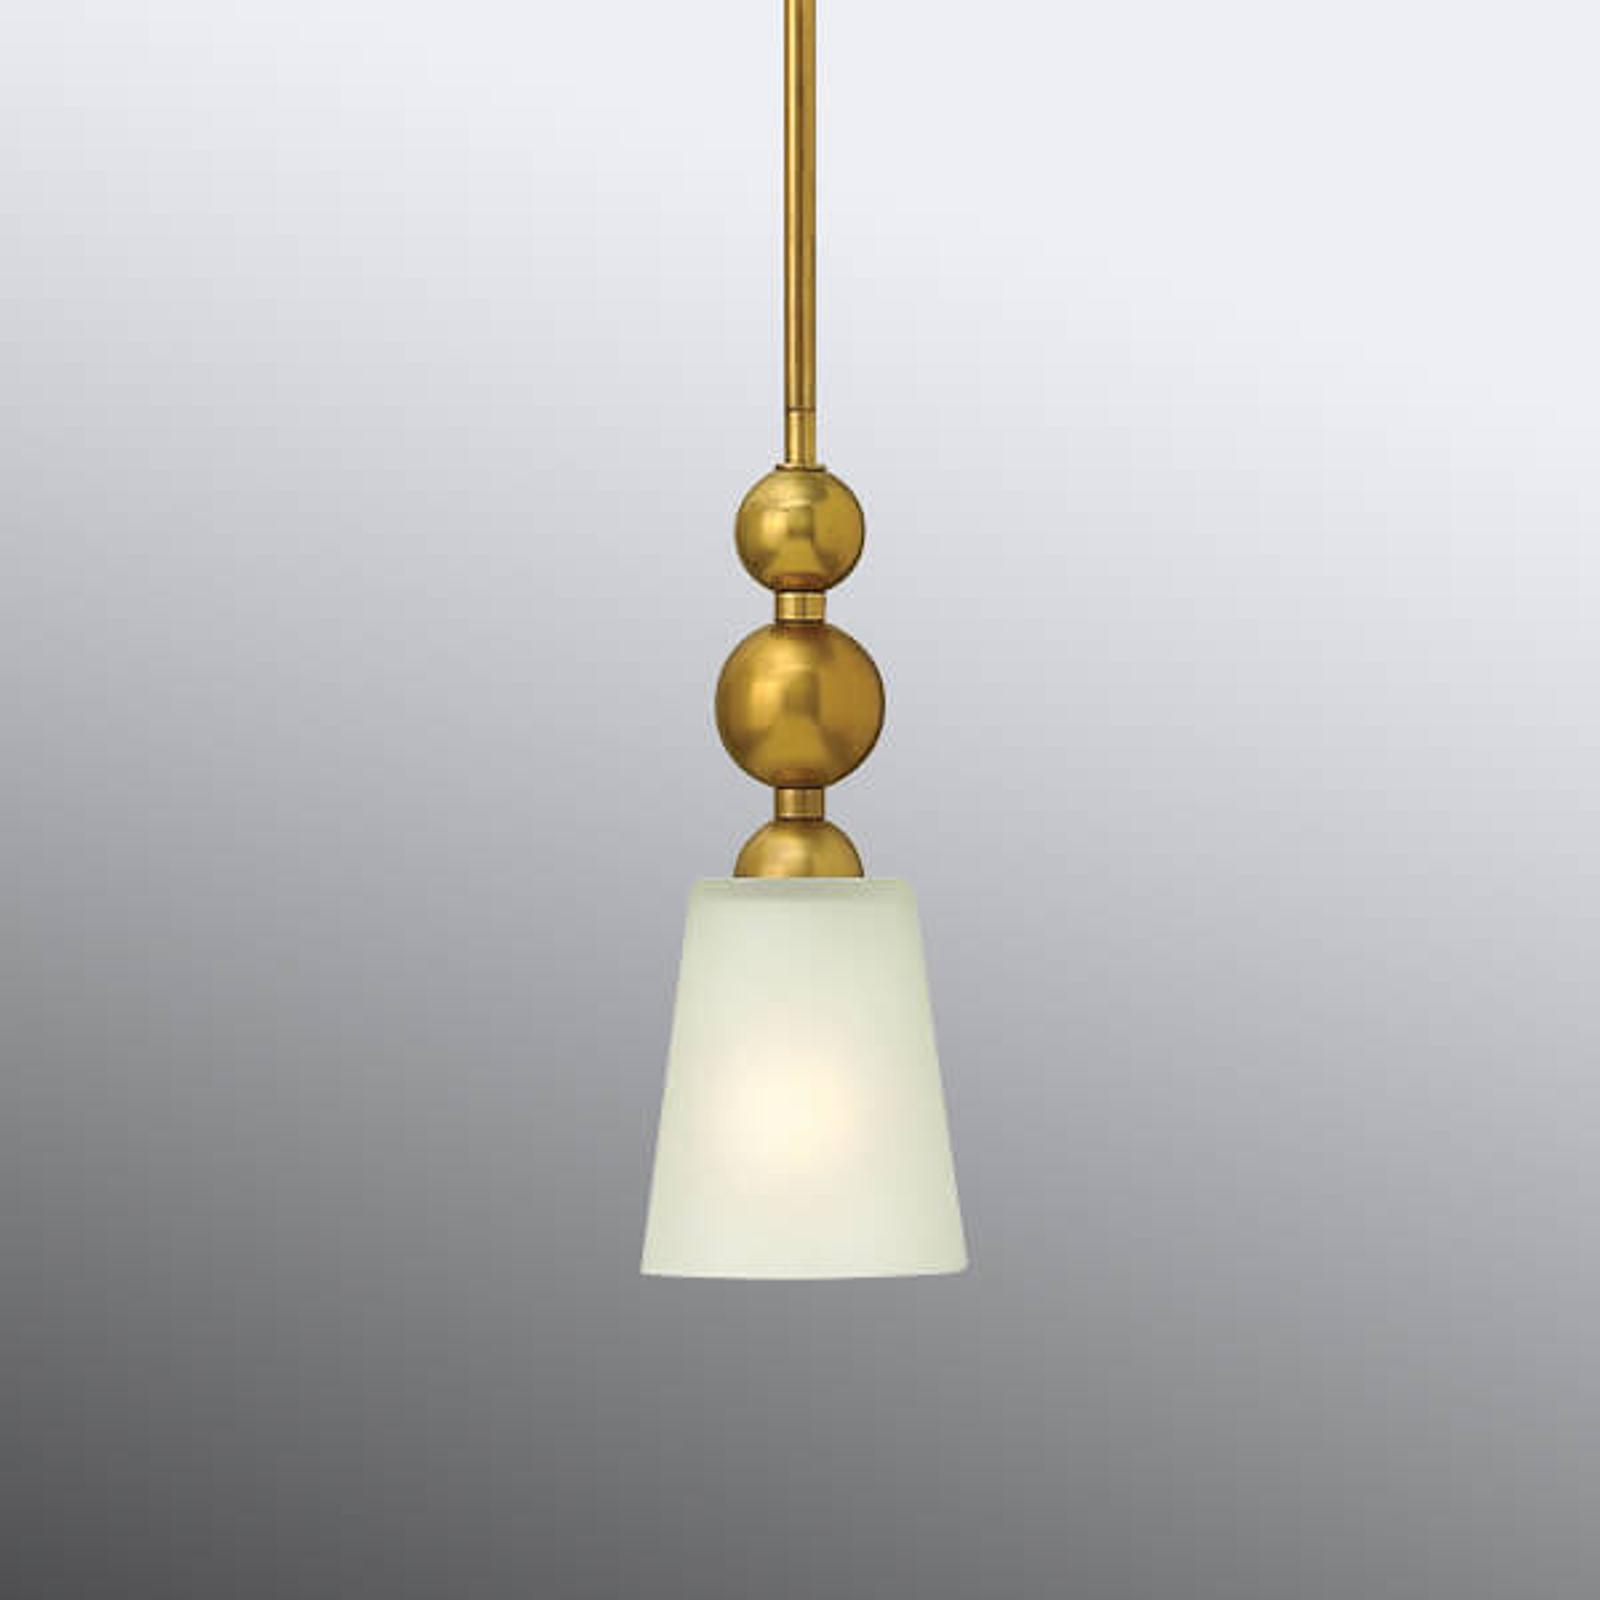 Hanglamp Zelda oudmessing Ø 12cm